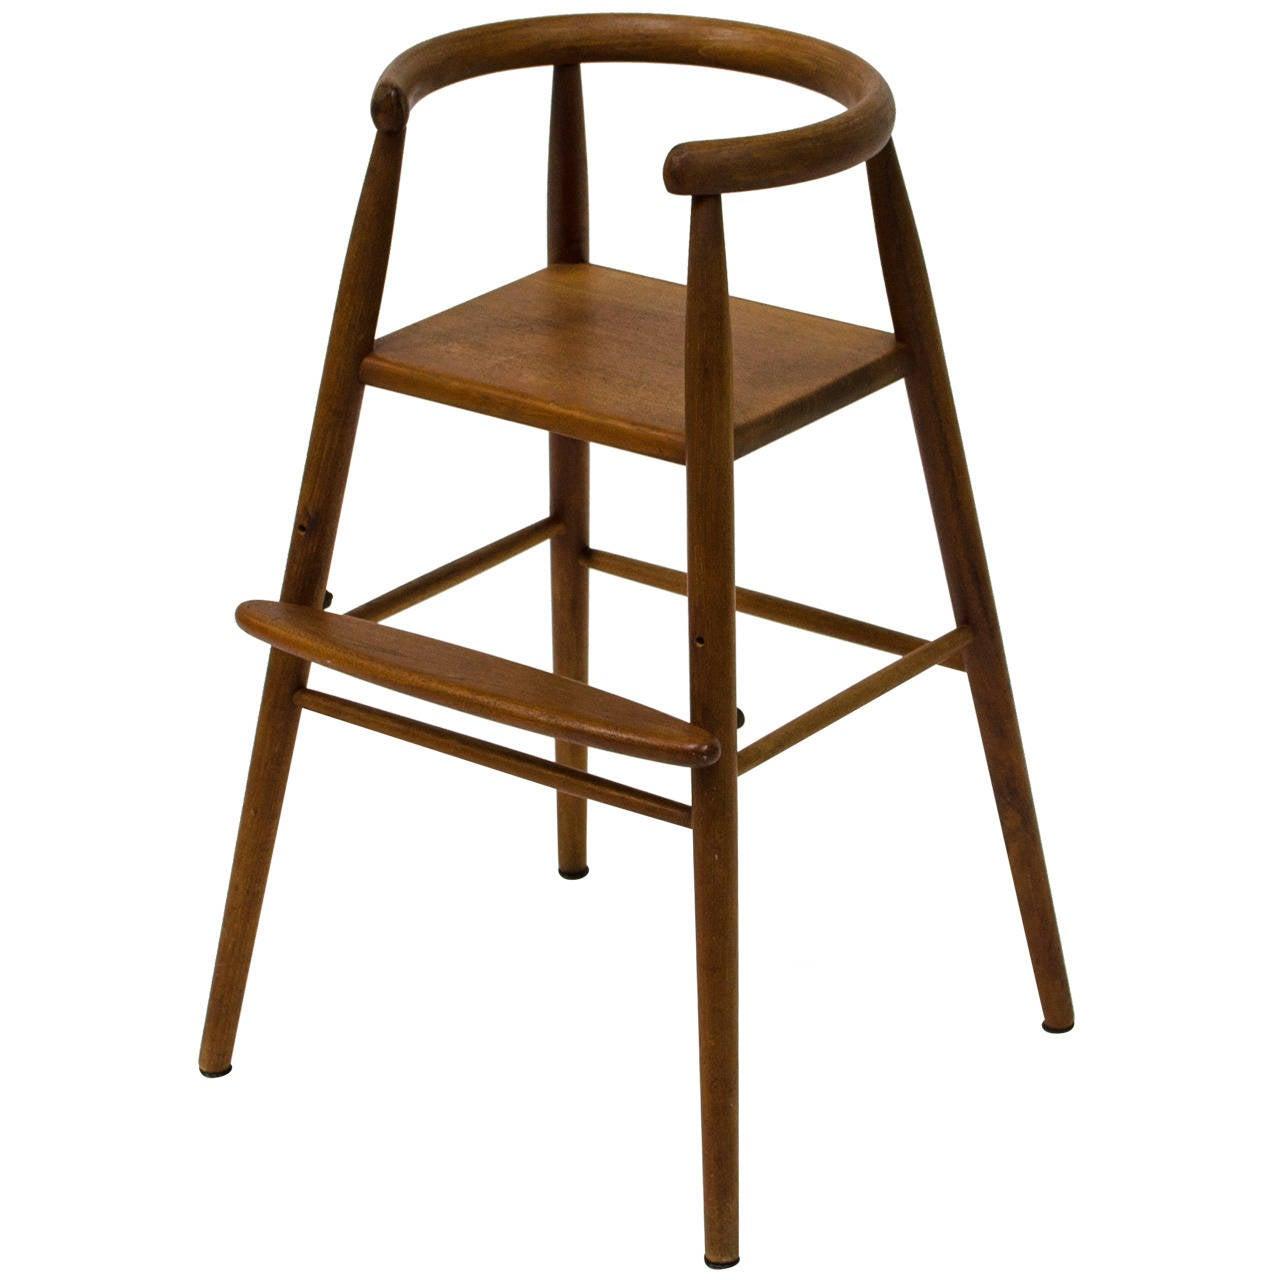 folding chair lulu desk and early nanna ditzel high 1950 at 1stdibs